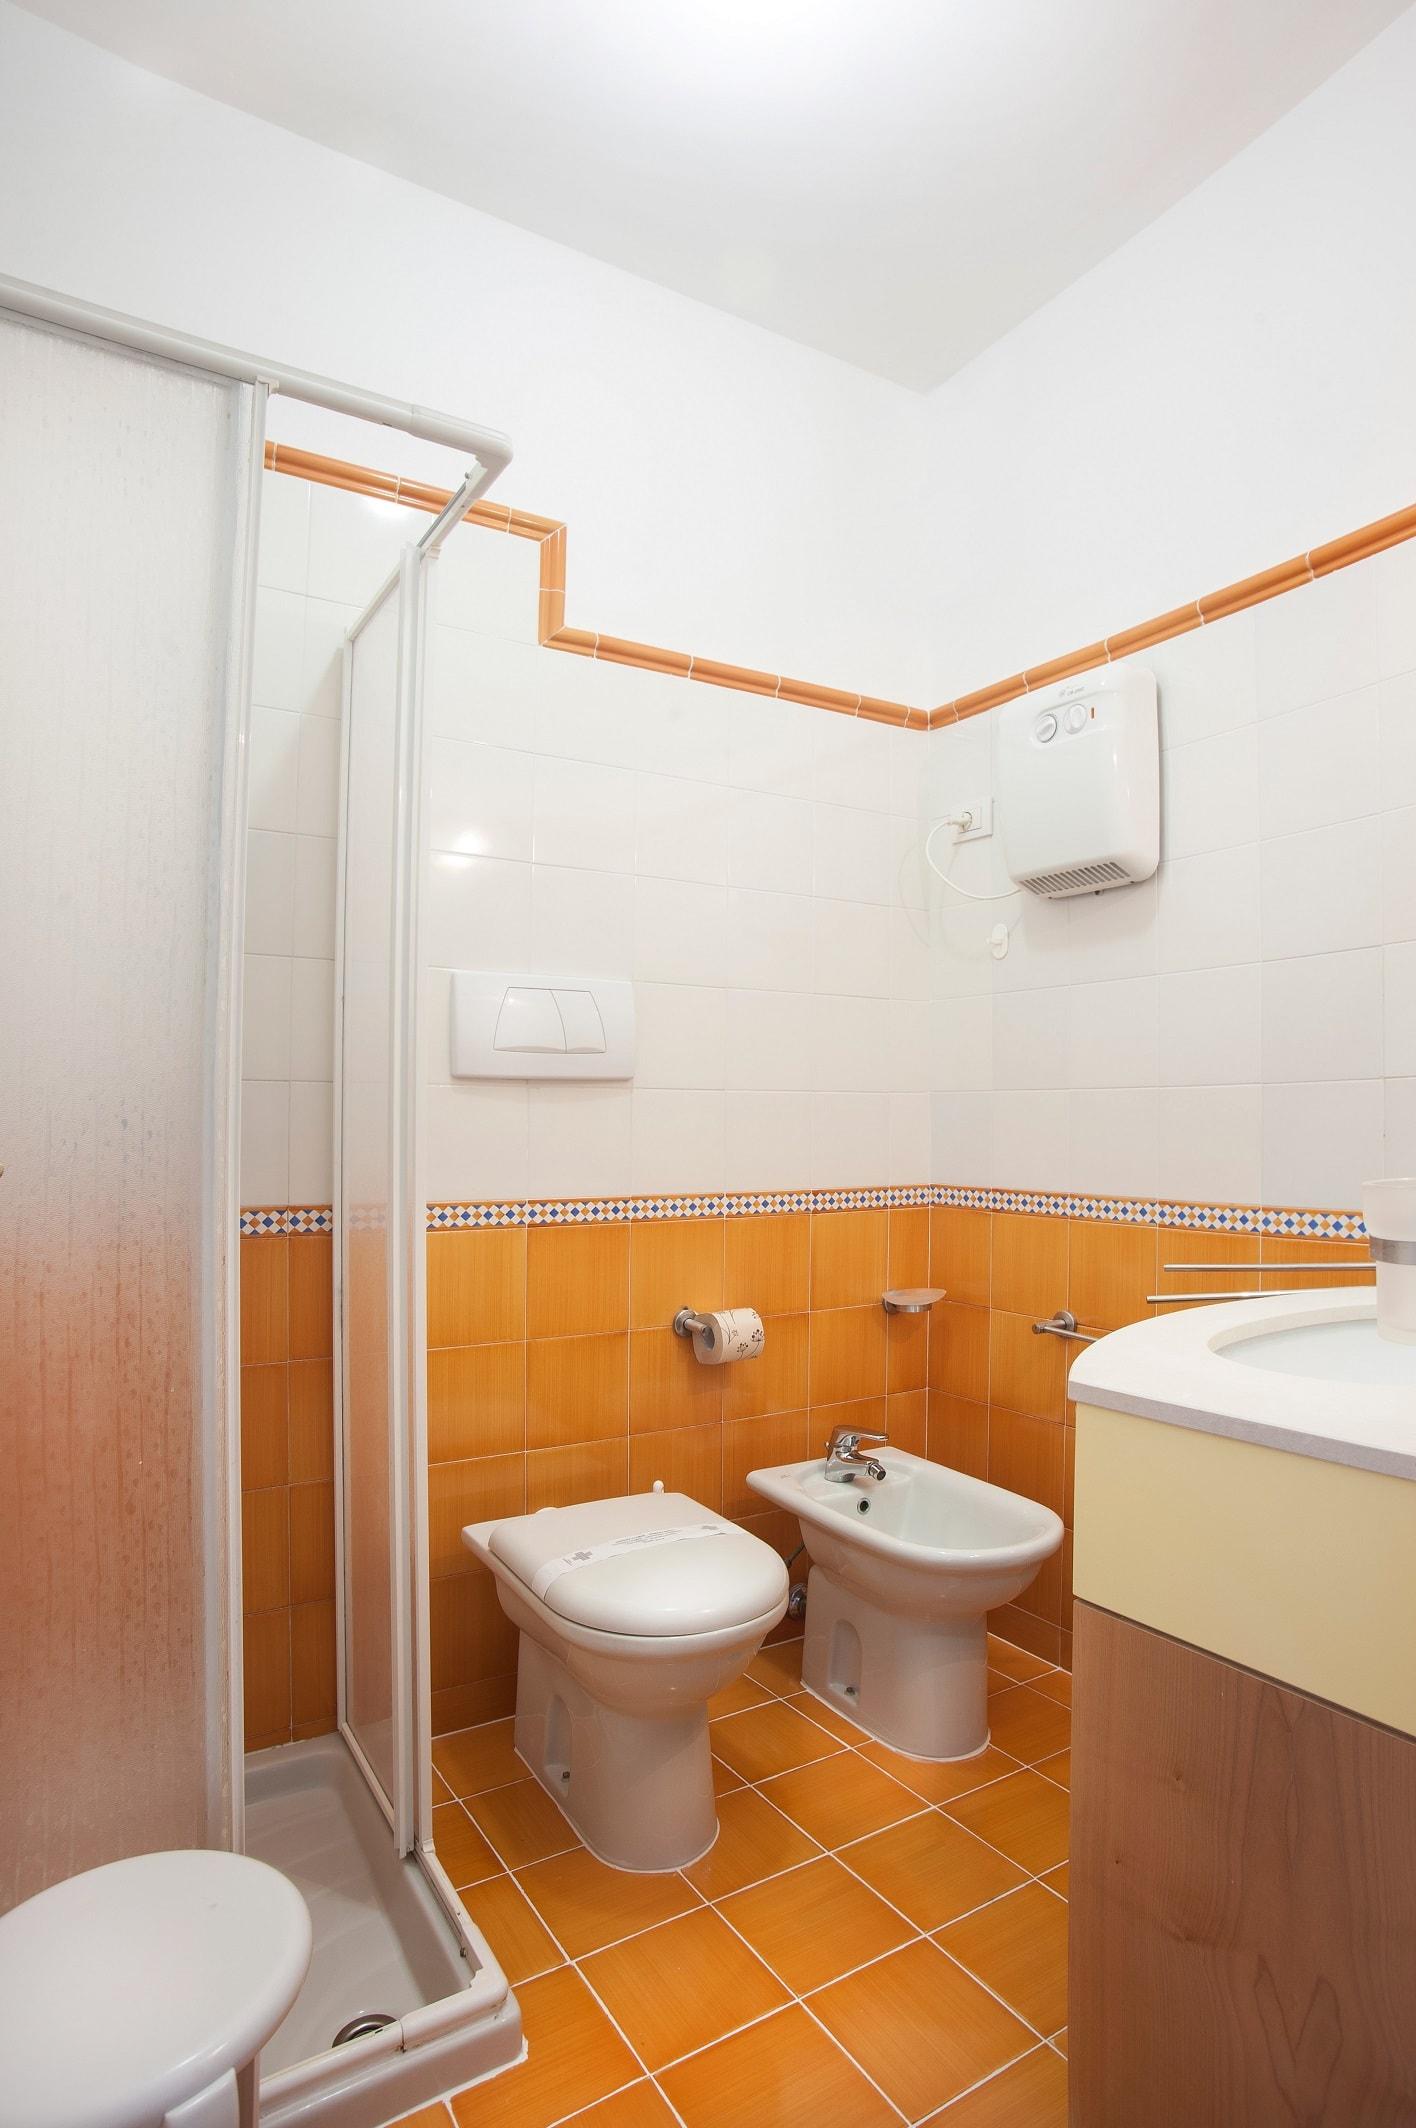 Hotel Residence in Salento | Oasi d'Oriente - 20